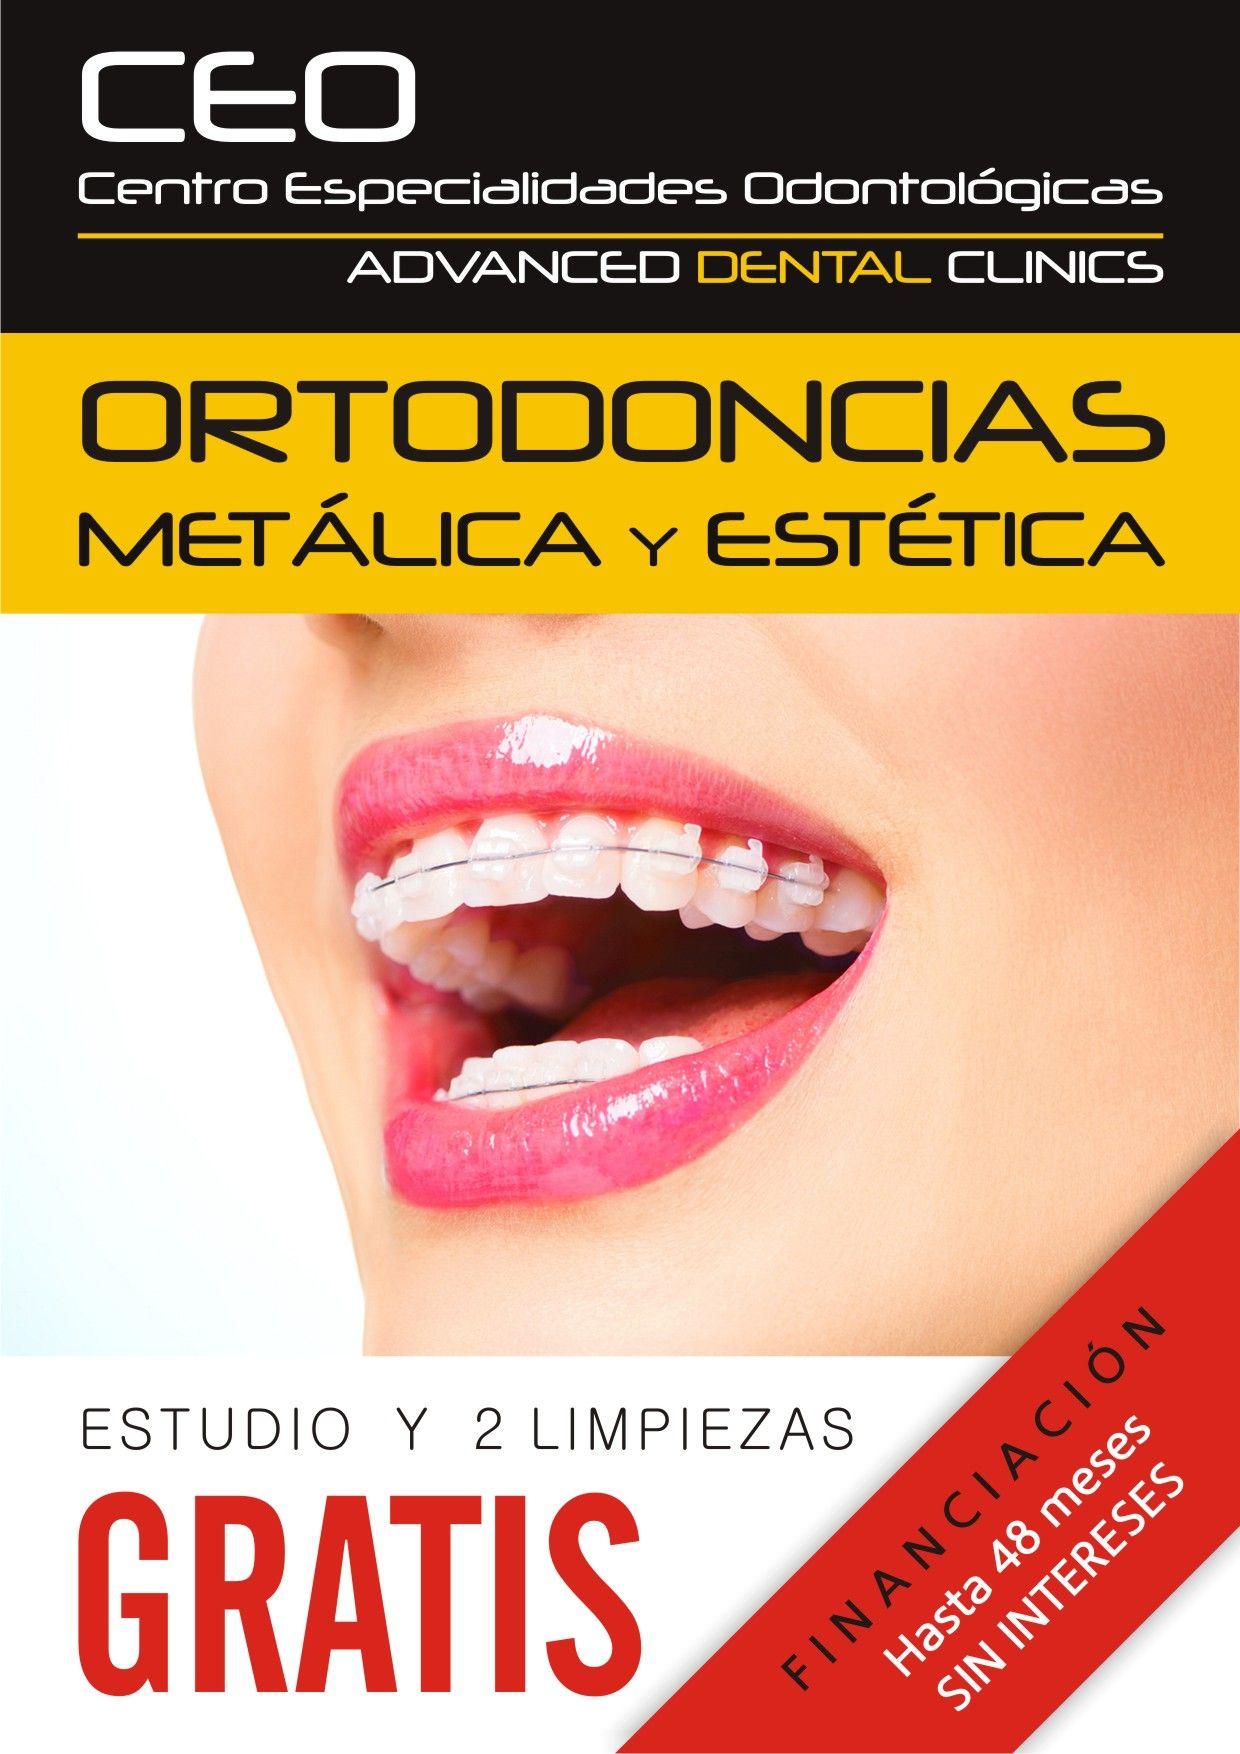 Brackets de zafiro: Tratamientos dentales de Centro Especialidades Odontologicas